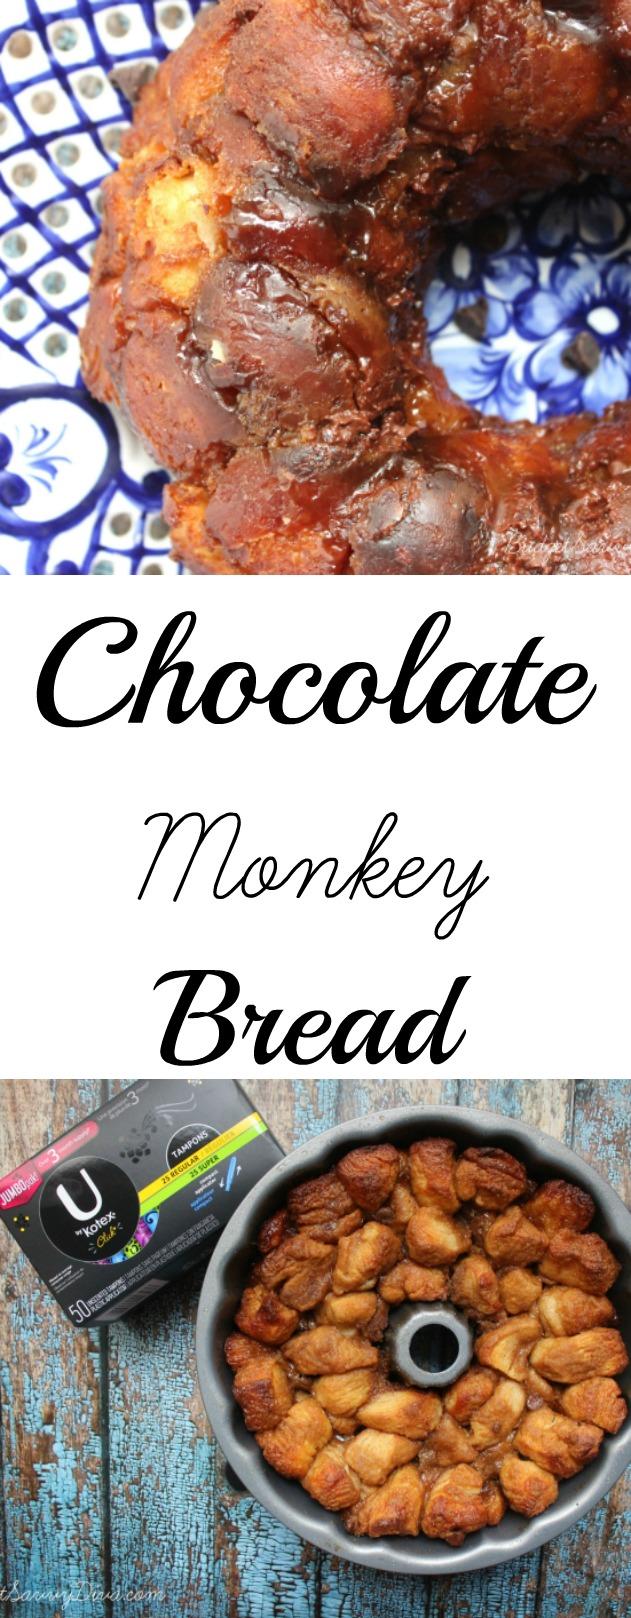 FINAL Chocolate Monkey Bread